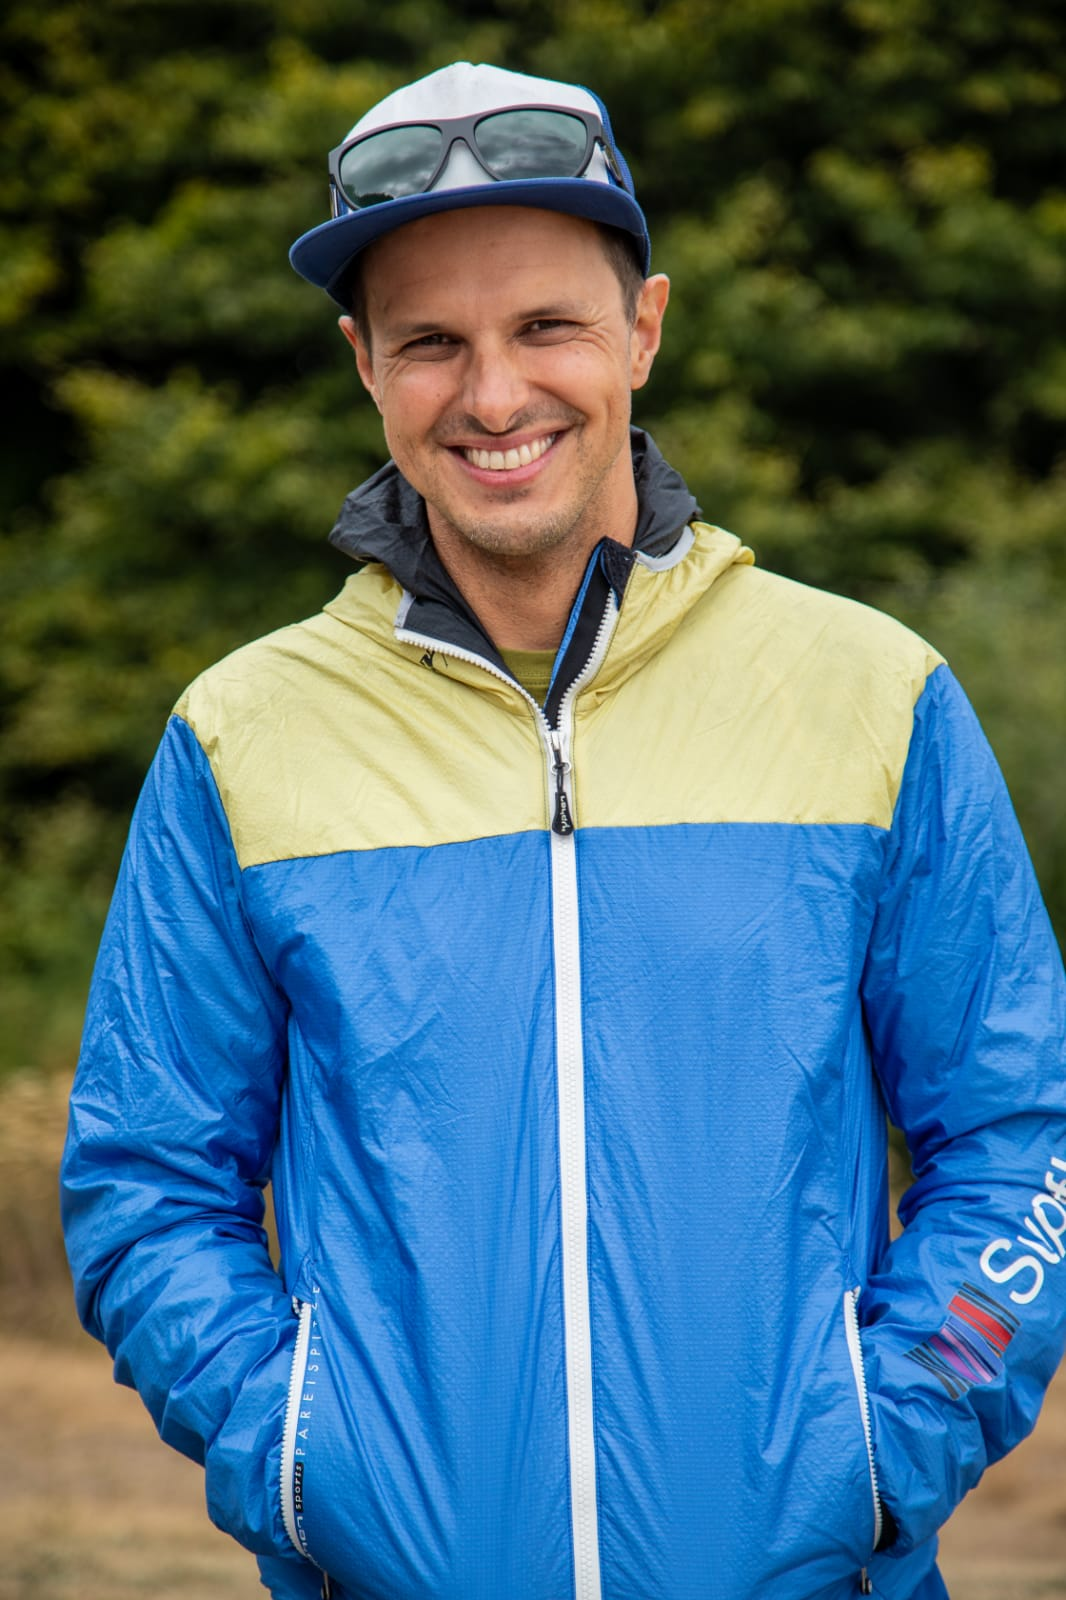 joachim-oberhauser-2019-campione-mondo.jpg